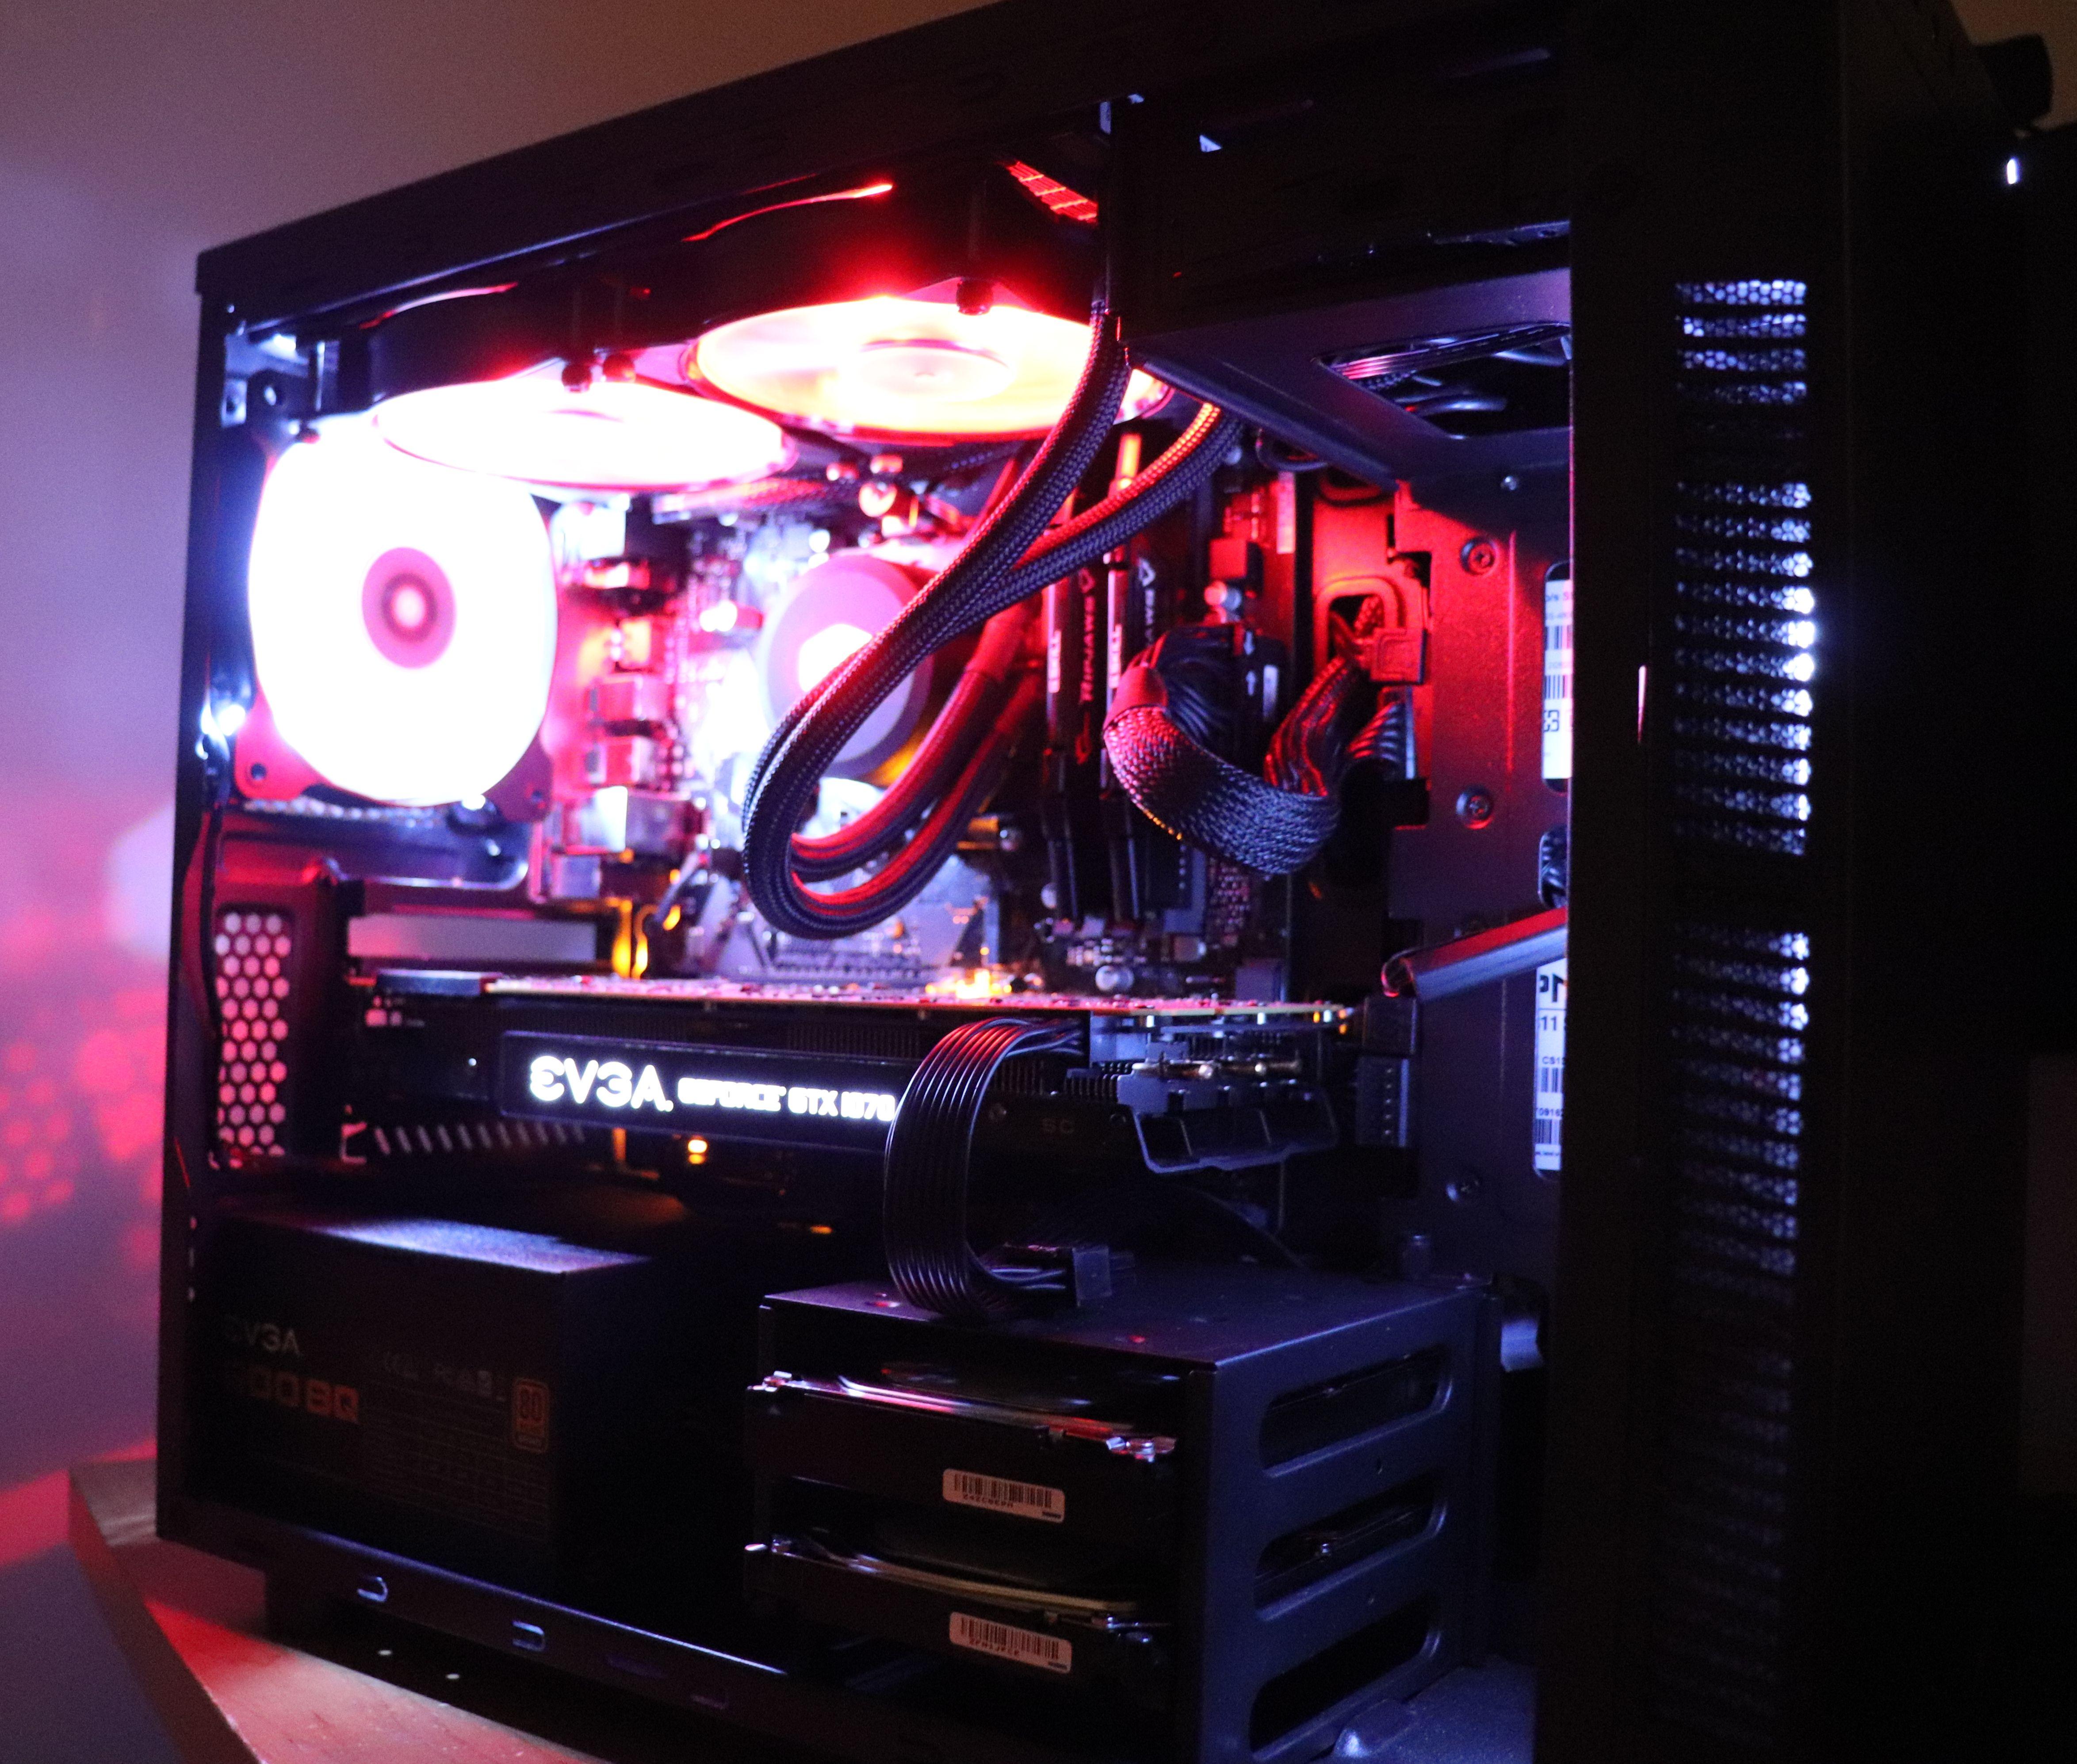 Linux Pc Build Building Setup Water Cooling